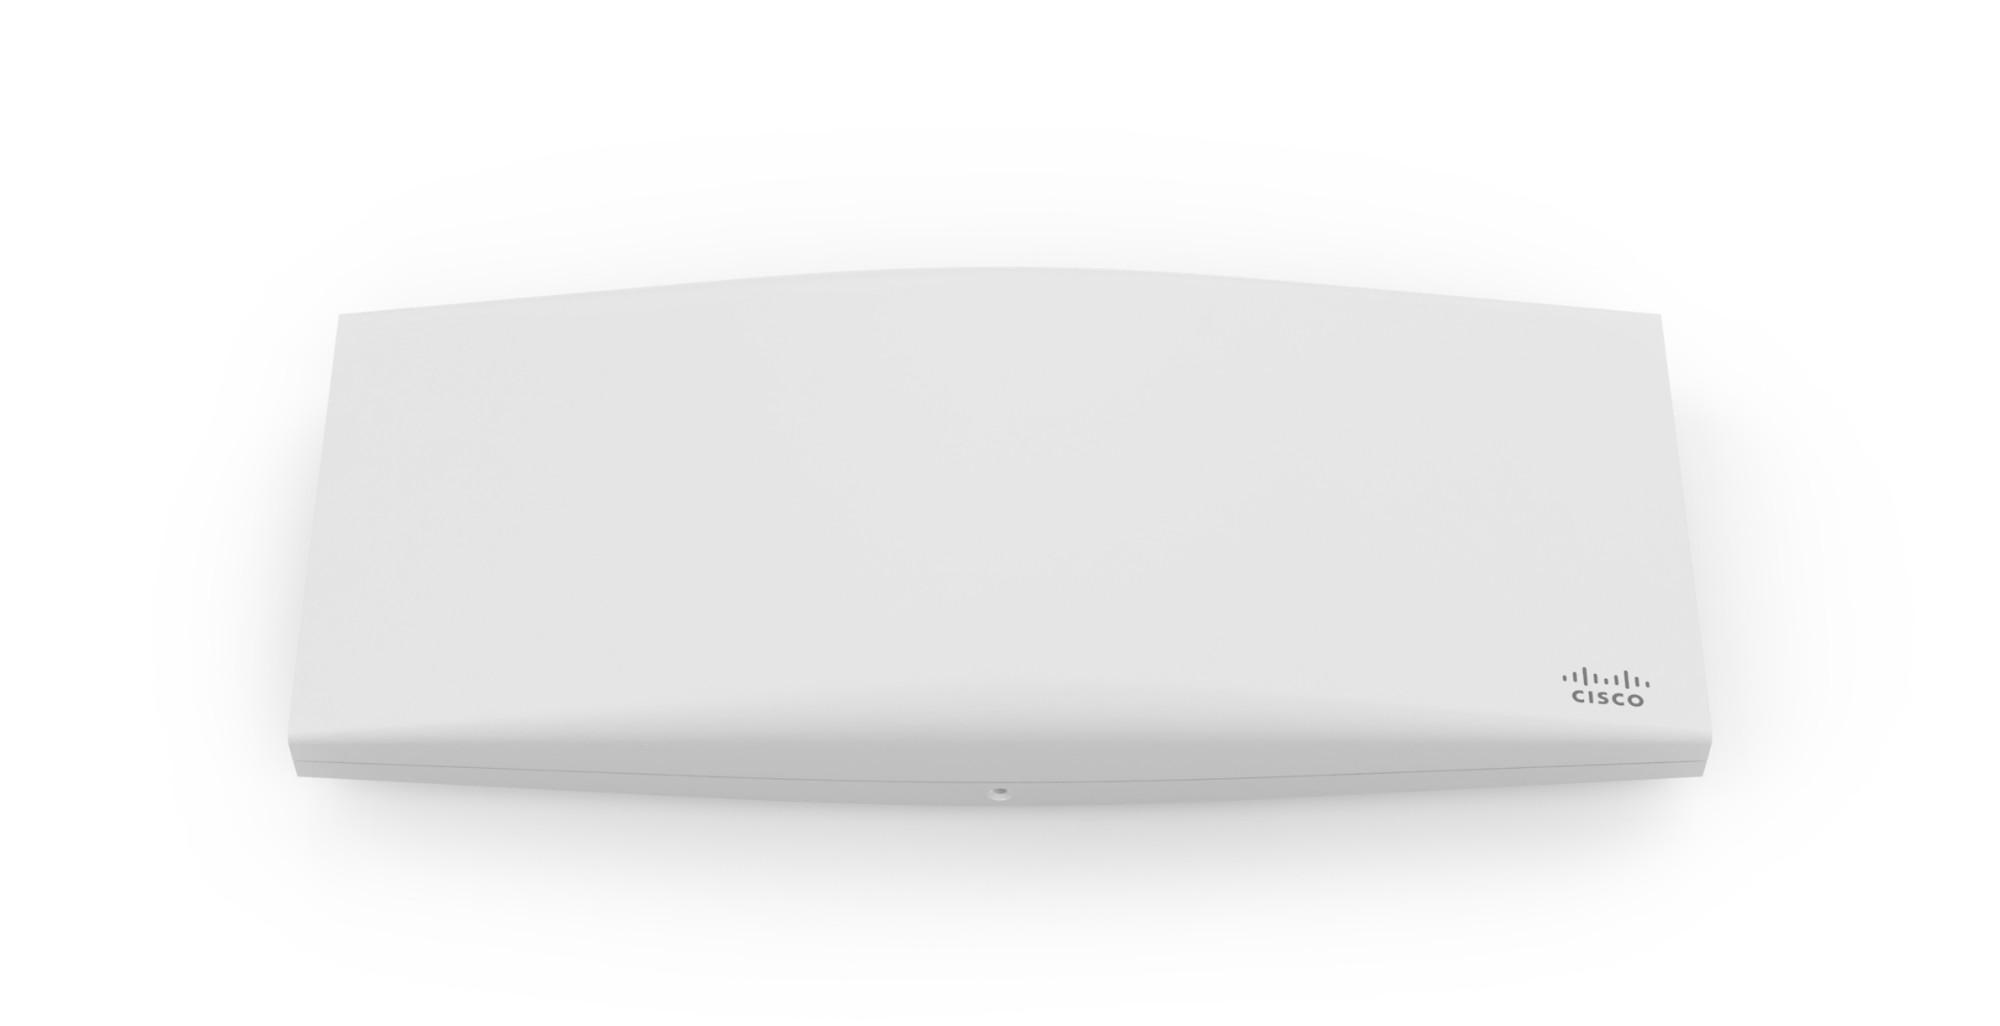 Cisco Meraki MR55 Energía sobre Ethernet (PoE) Blanco